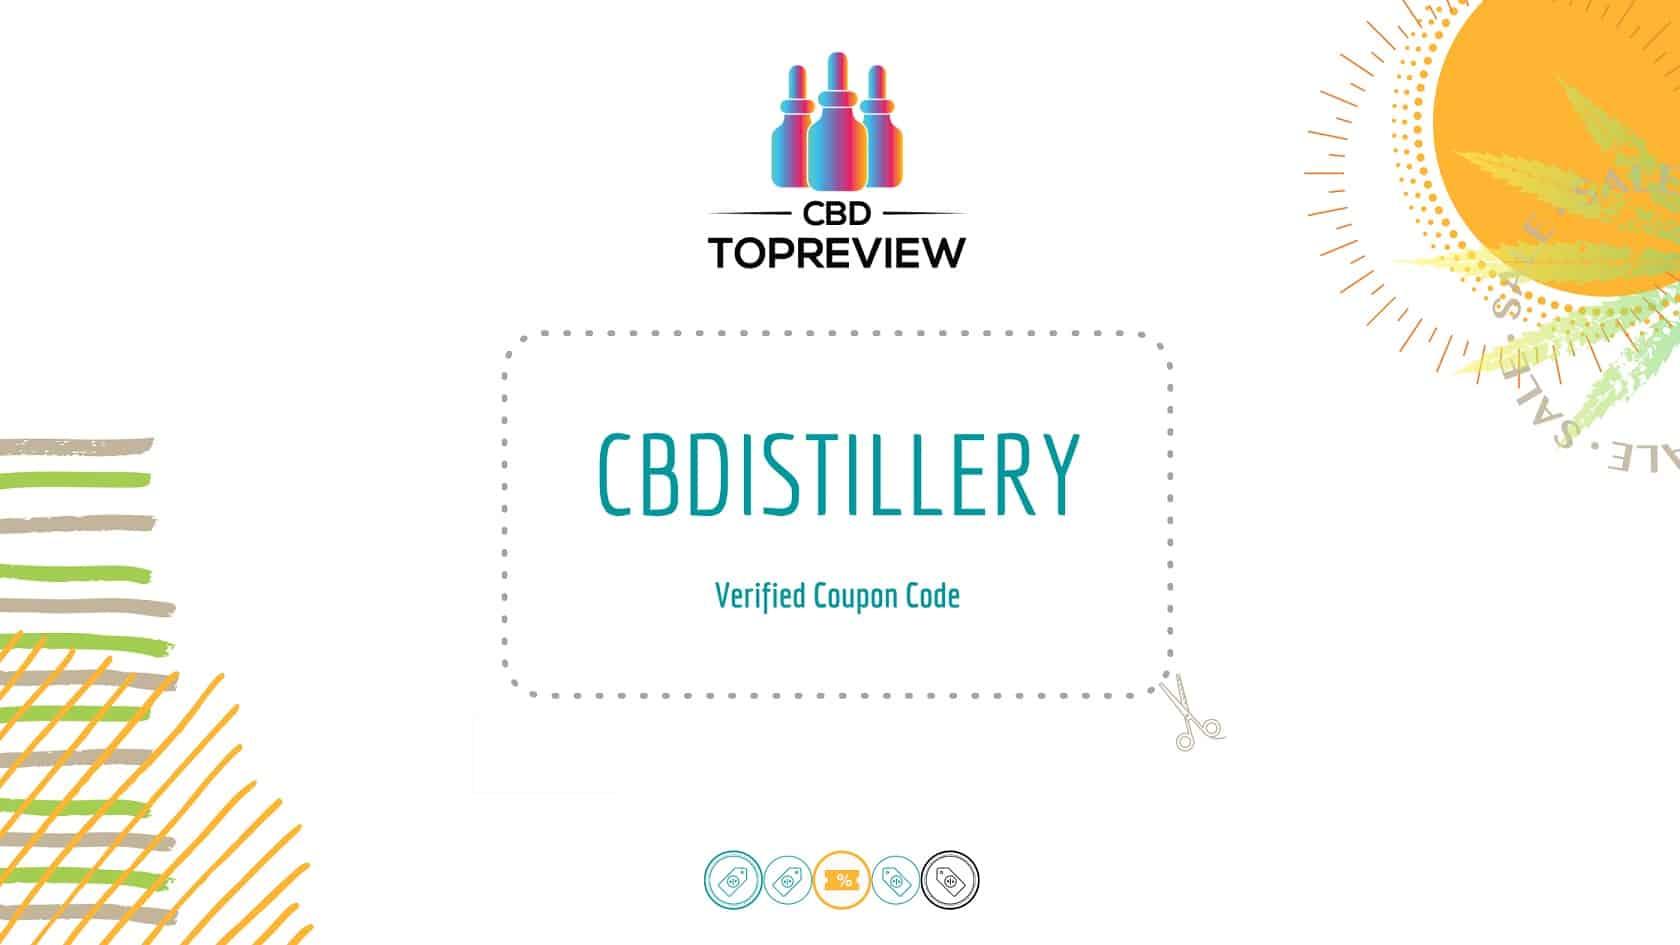 CBDistillery Verified Coupon Code